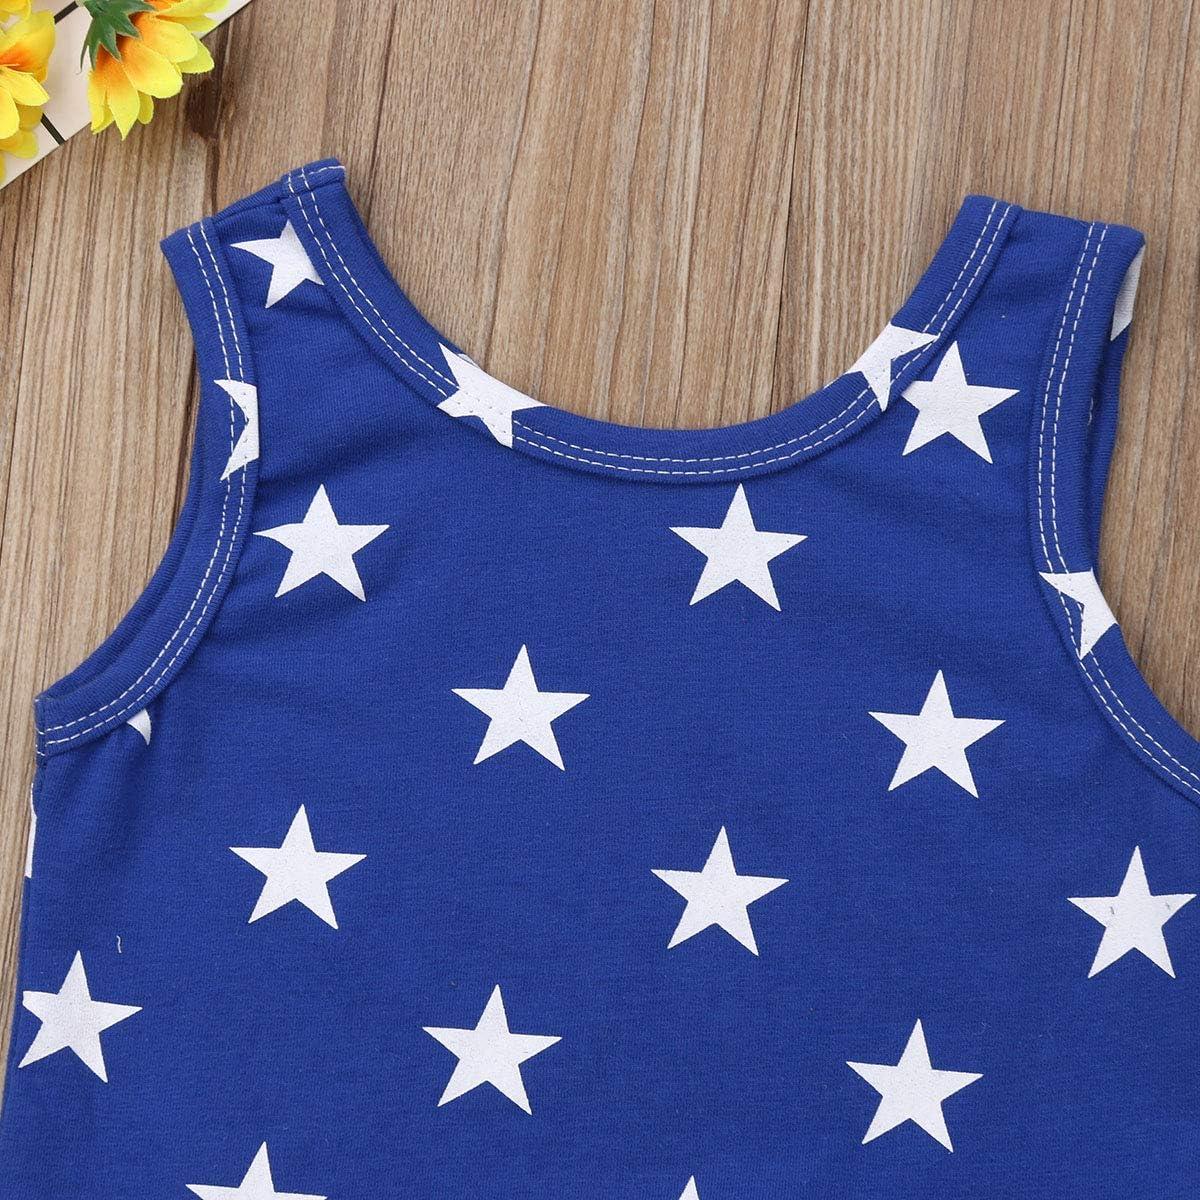 2Pcs//Set Independence Day Infant Toddler Baby Boys Girls Sleeveless Top+Stripes Pompon Shorts